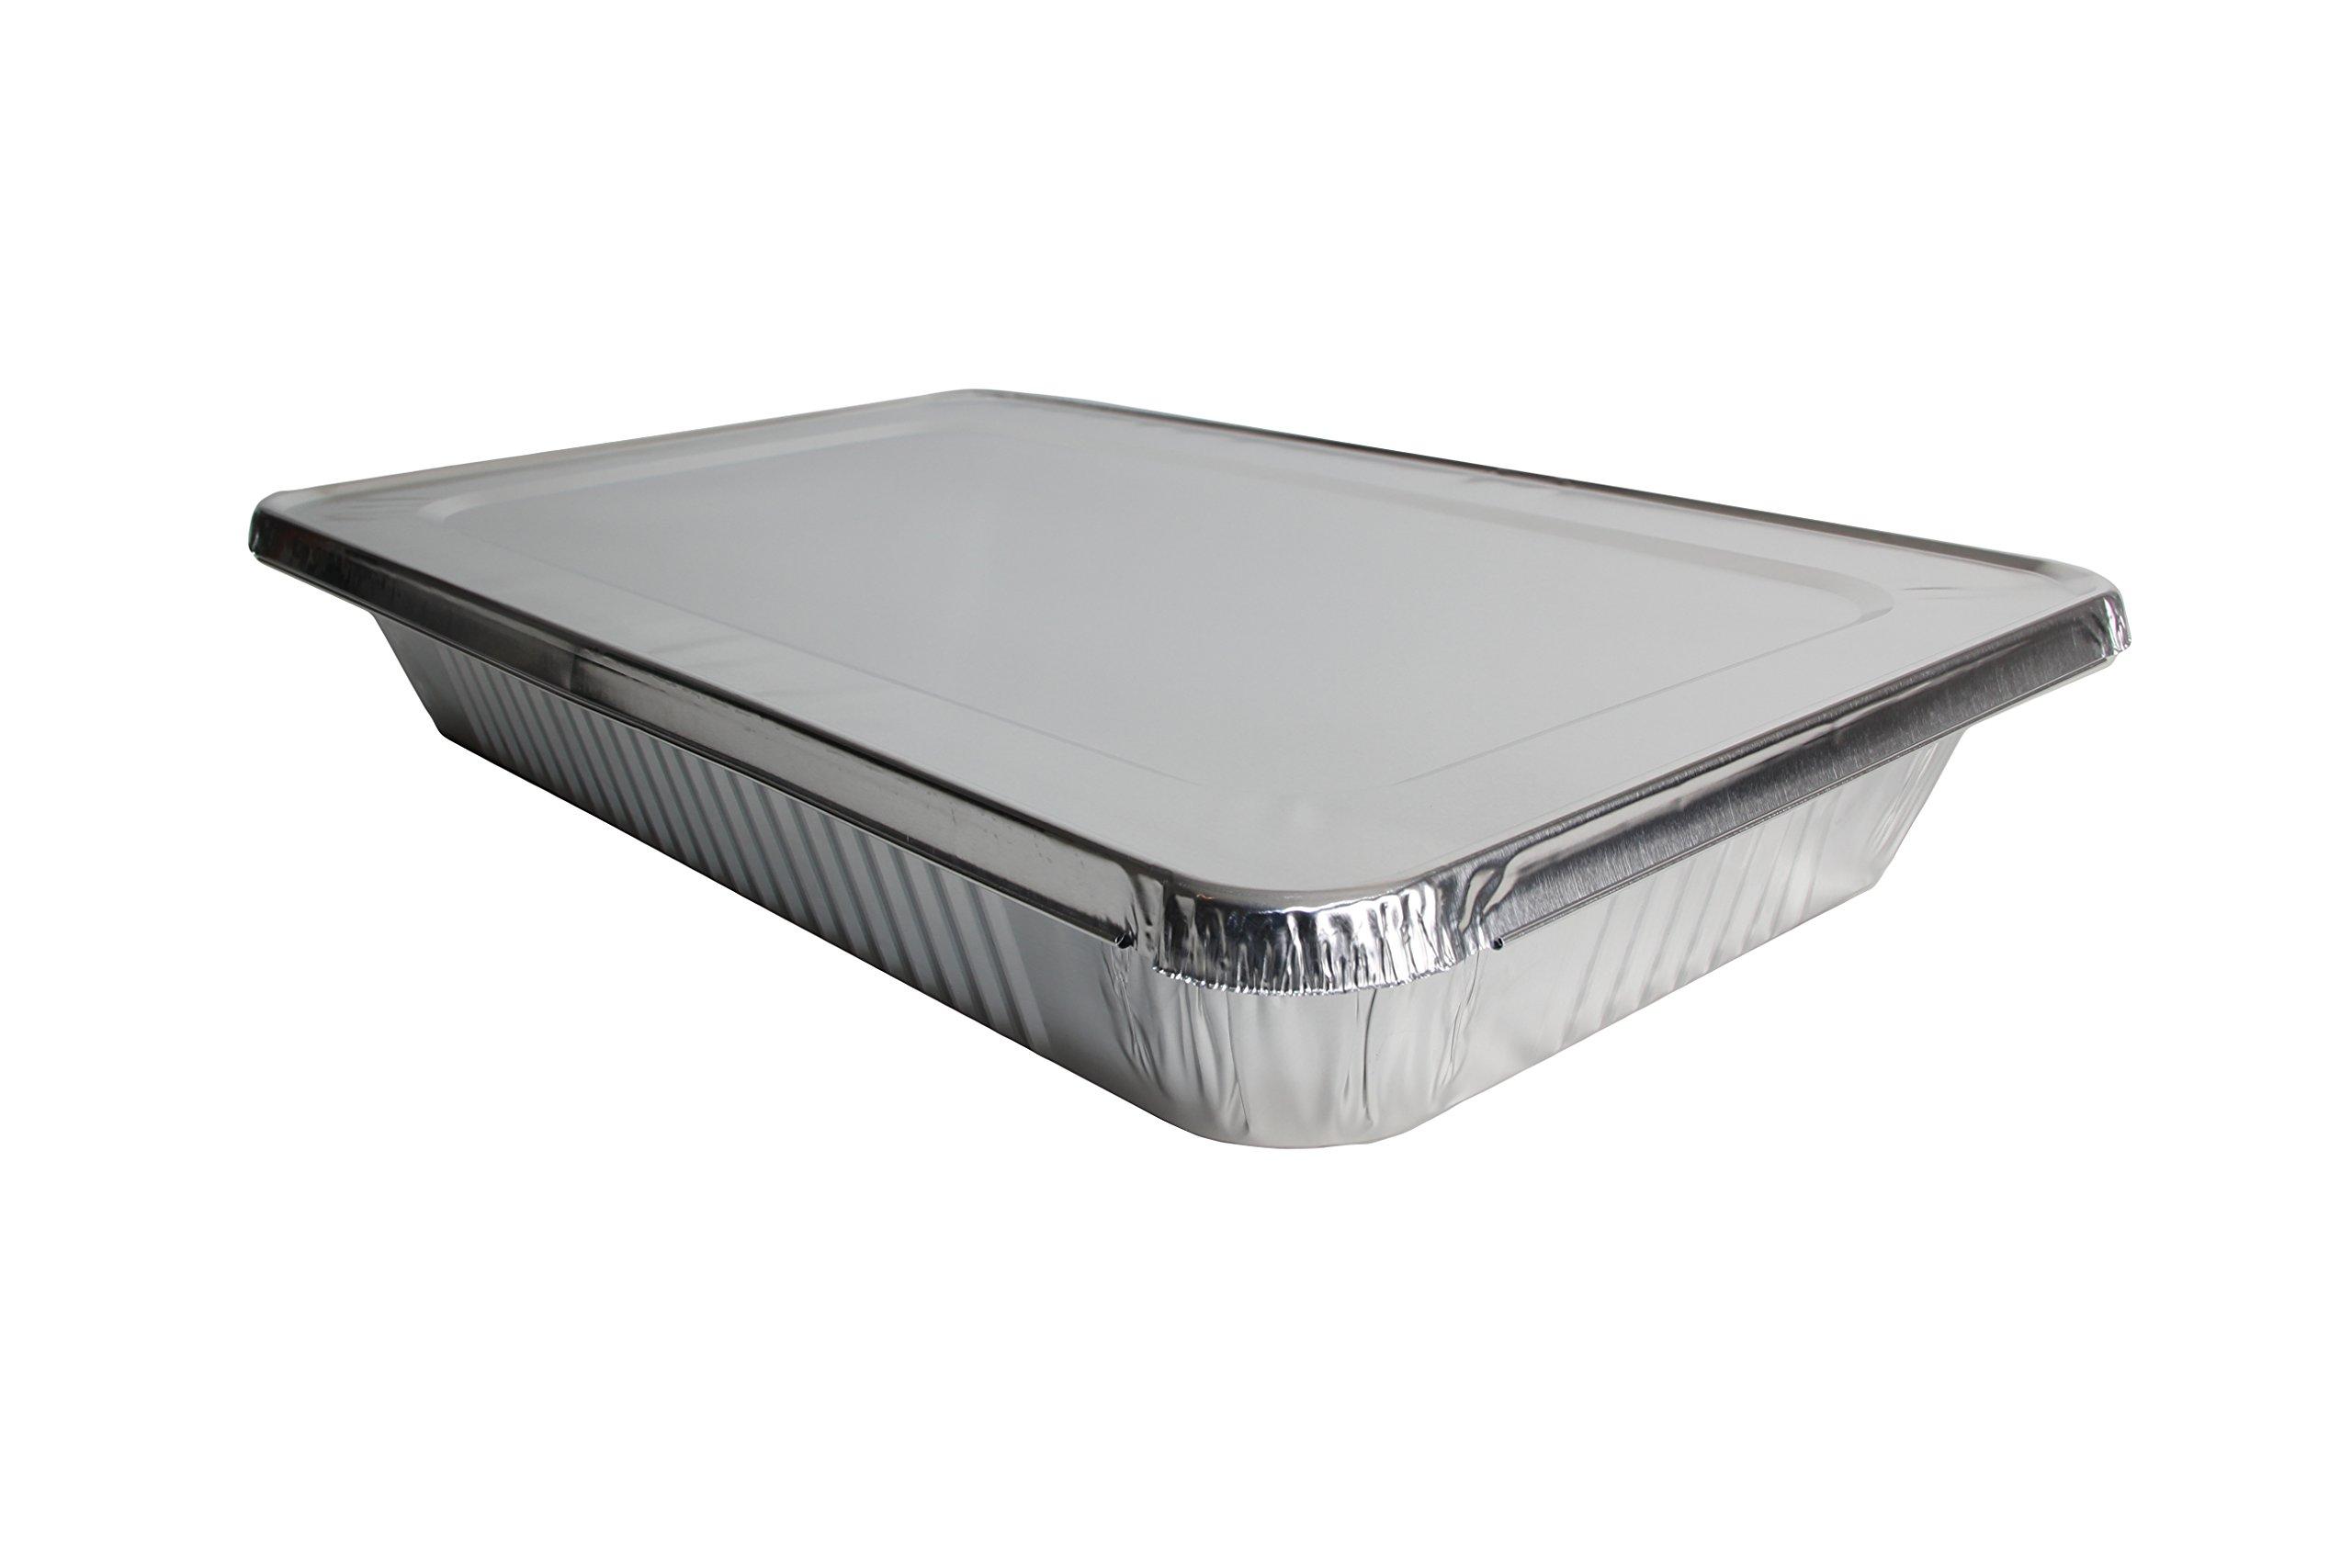 Ehomea2z Full Size Deep Disposable Aluminum Foil Steam